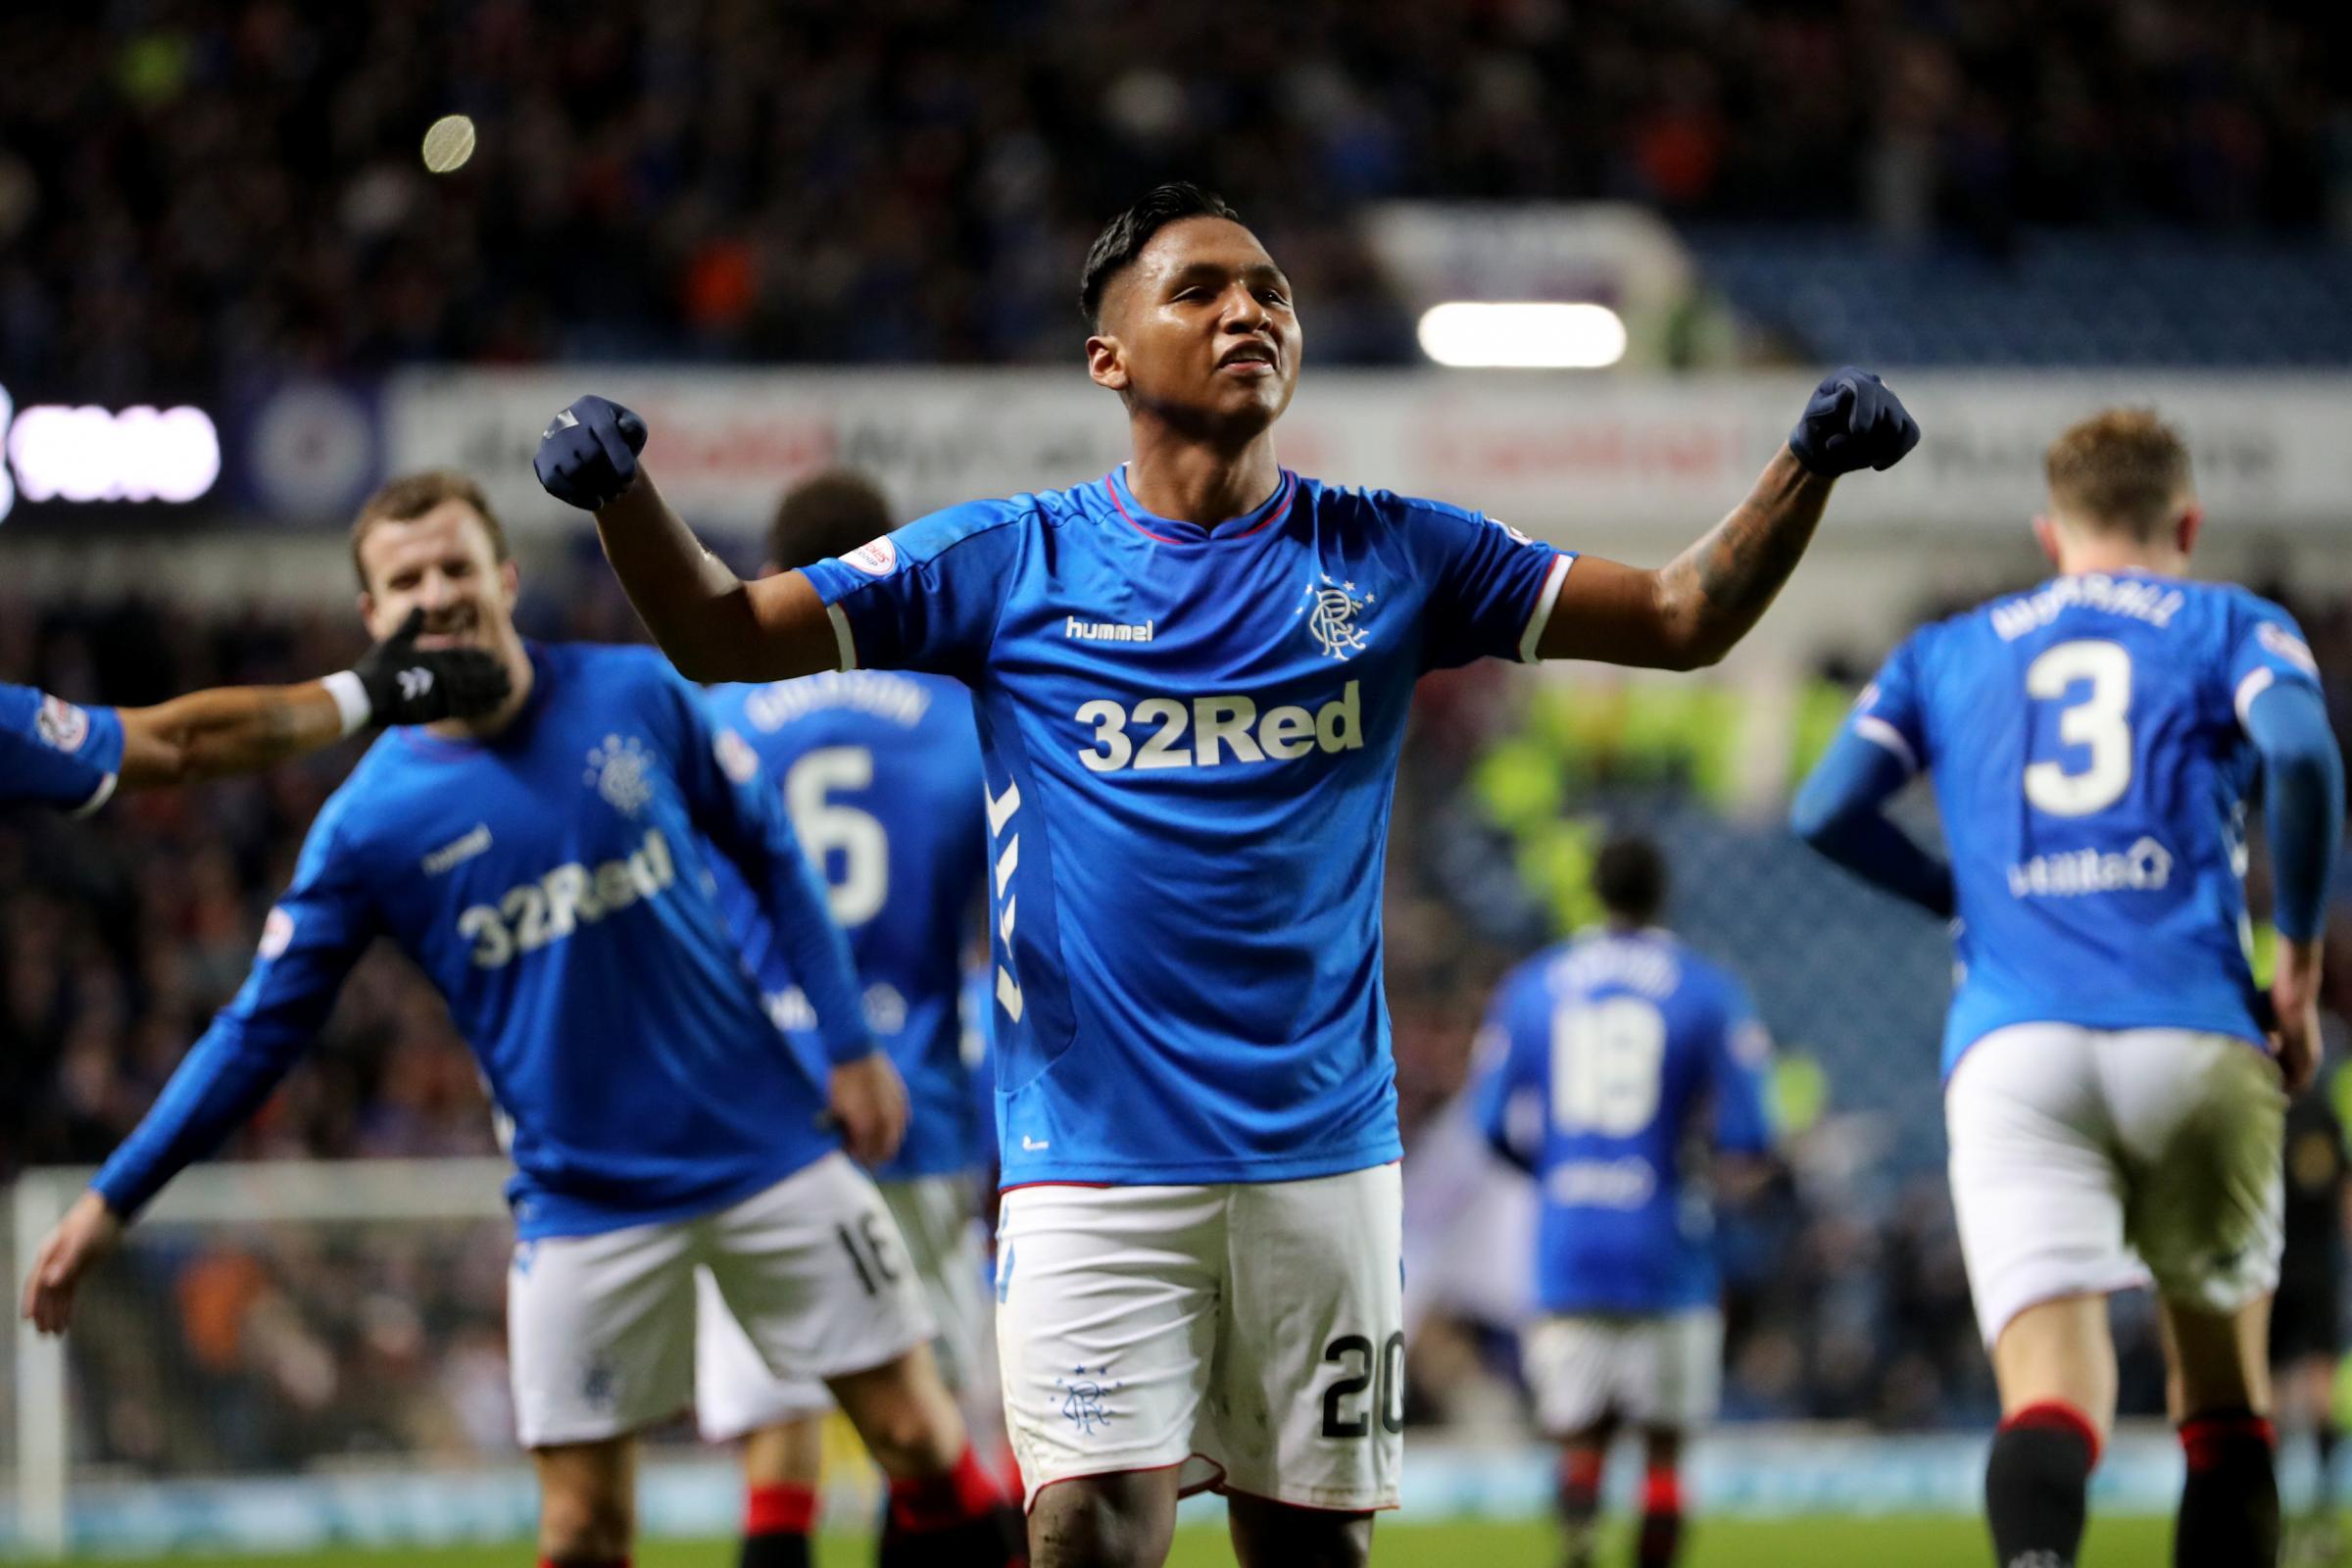 Rangers 5-0 Kilmarnock: Alfredo Morelos hits four as Steven Gerrard's side clinch quarter-final spot